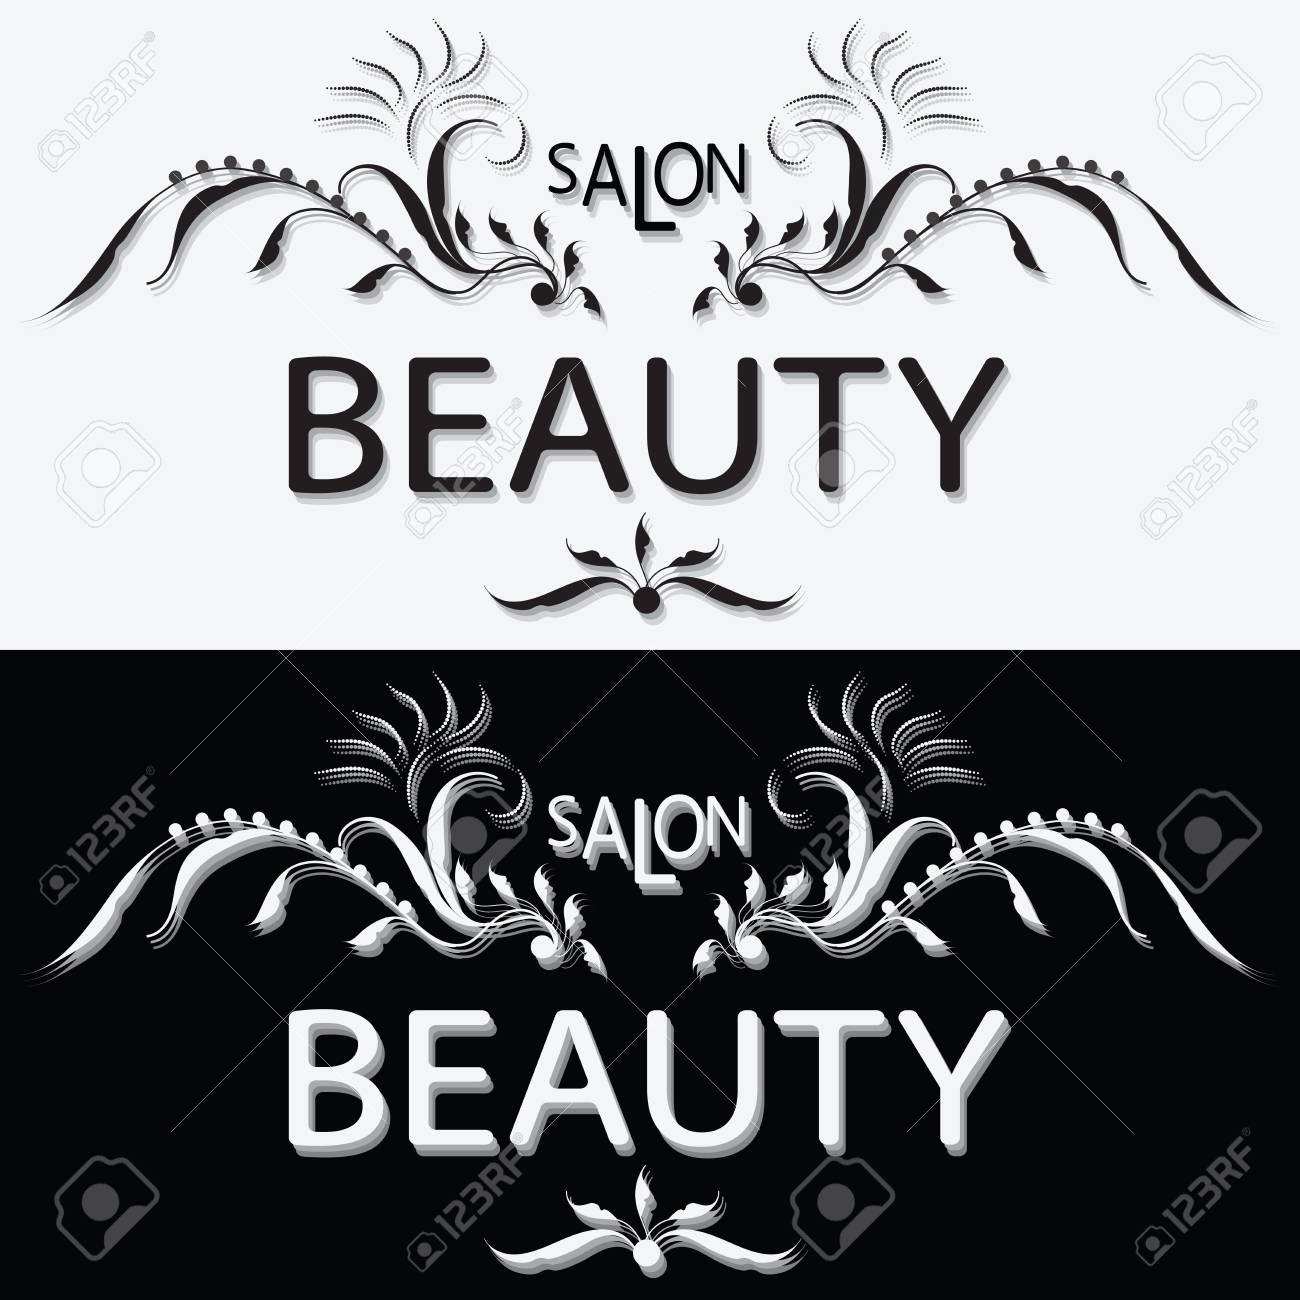 BEAUTY SALON  Black and white label  Set  The logo design  Handmade